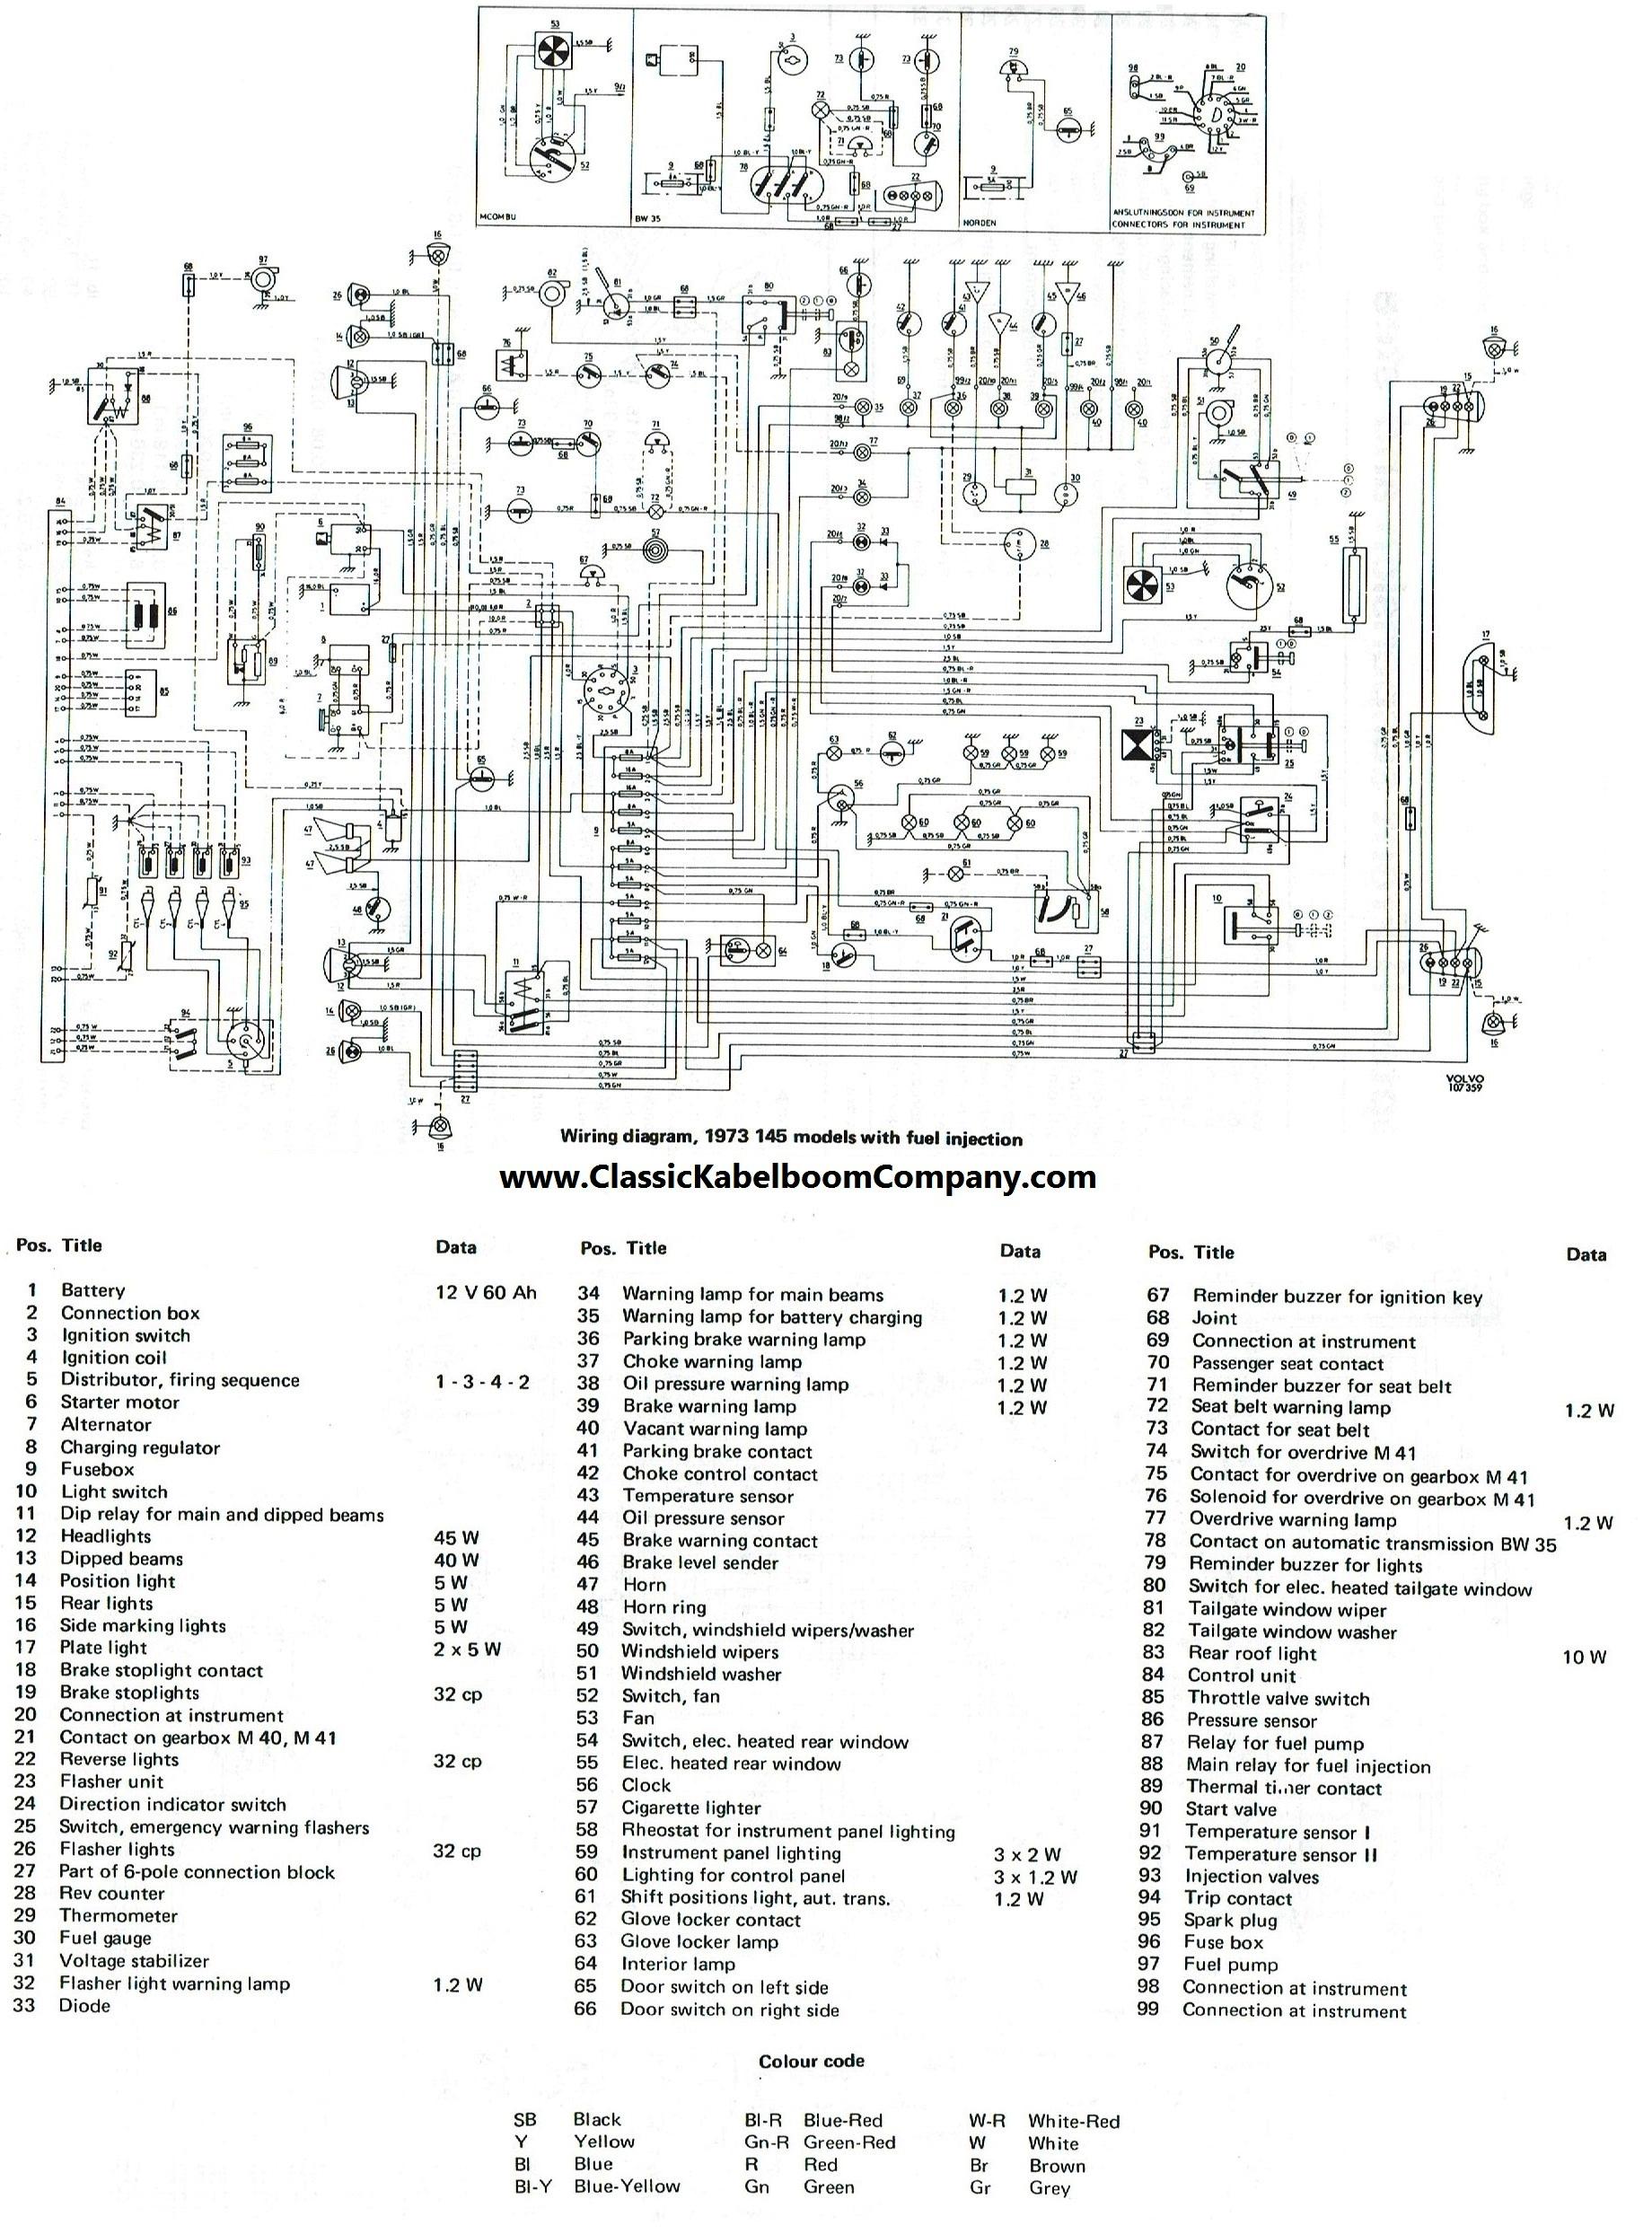 classic kabelboom company elektrisch bedrading schema volvo rh classickabelboomcompany com